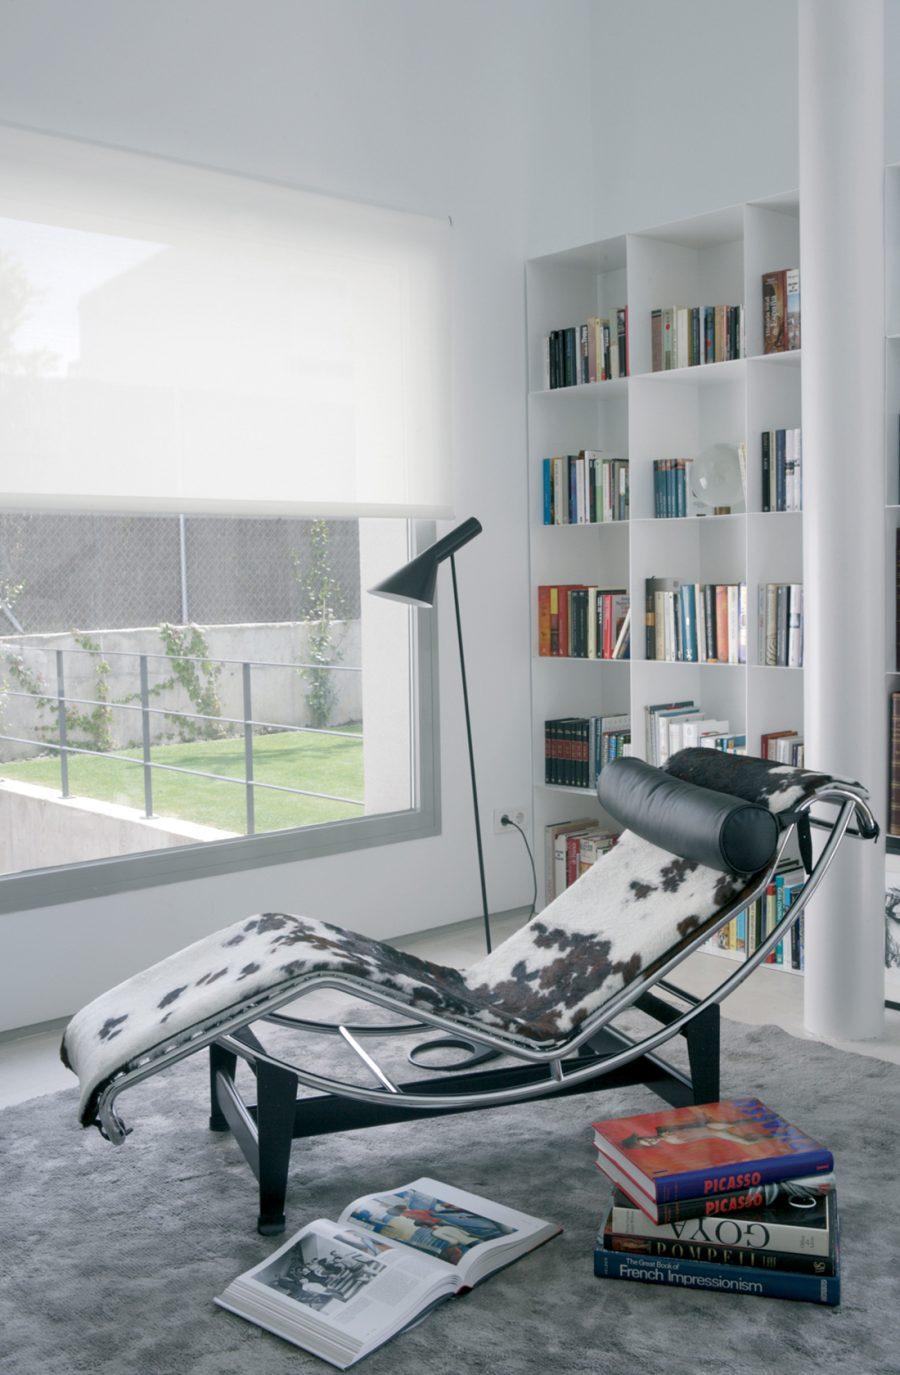 Casa c 29 salon interiorismo batavia 3